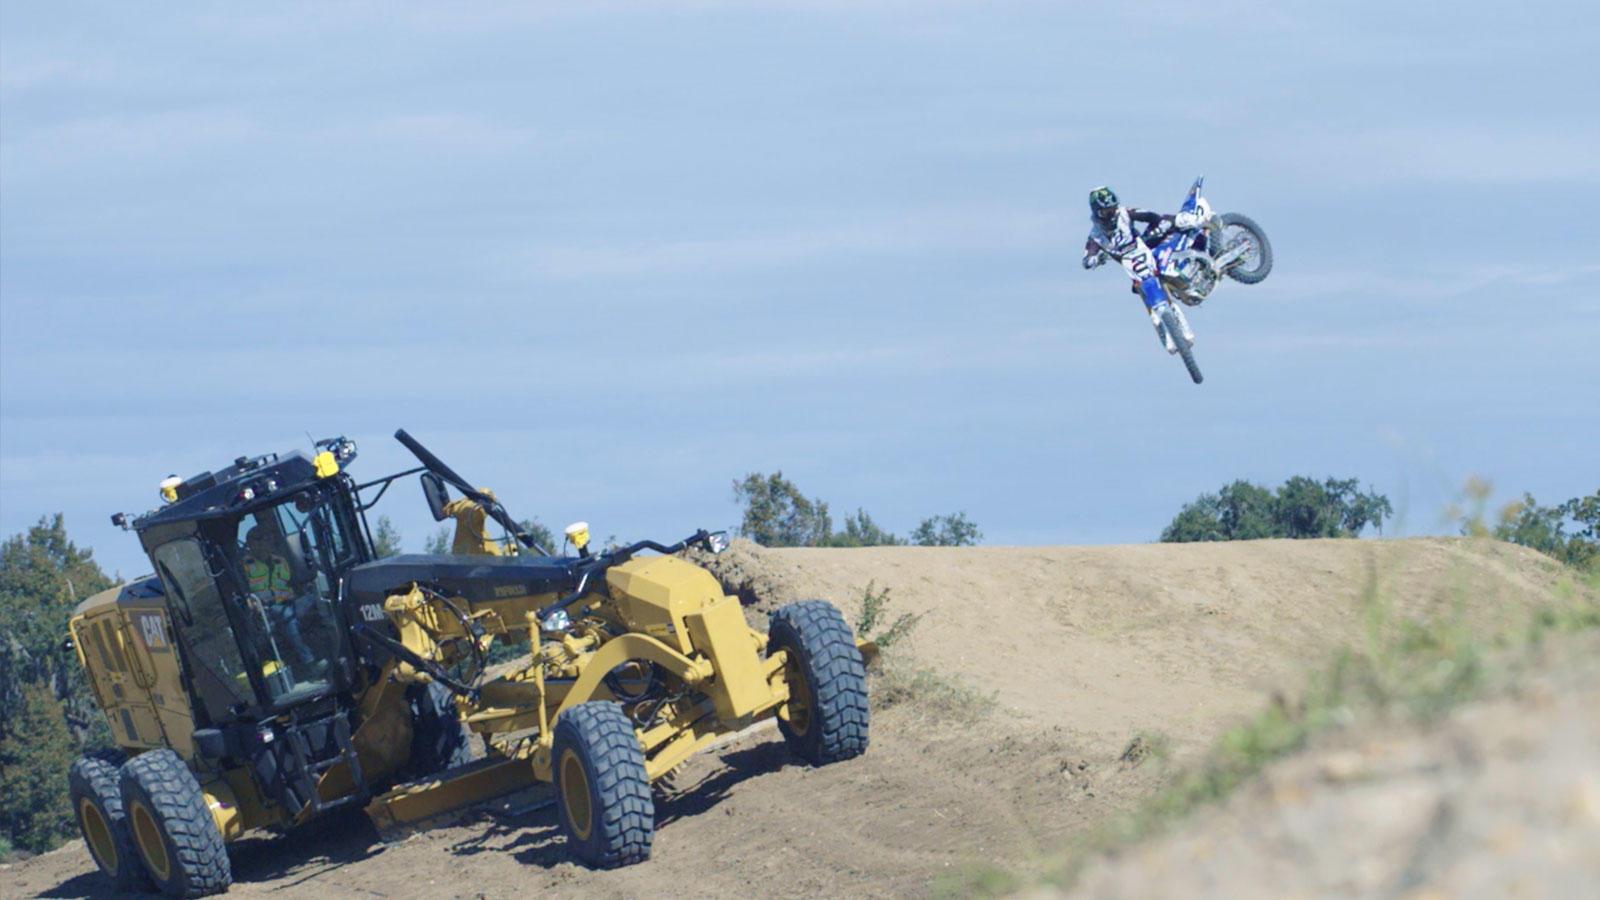 ryan villopoto jumps over a motor grader